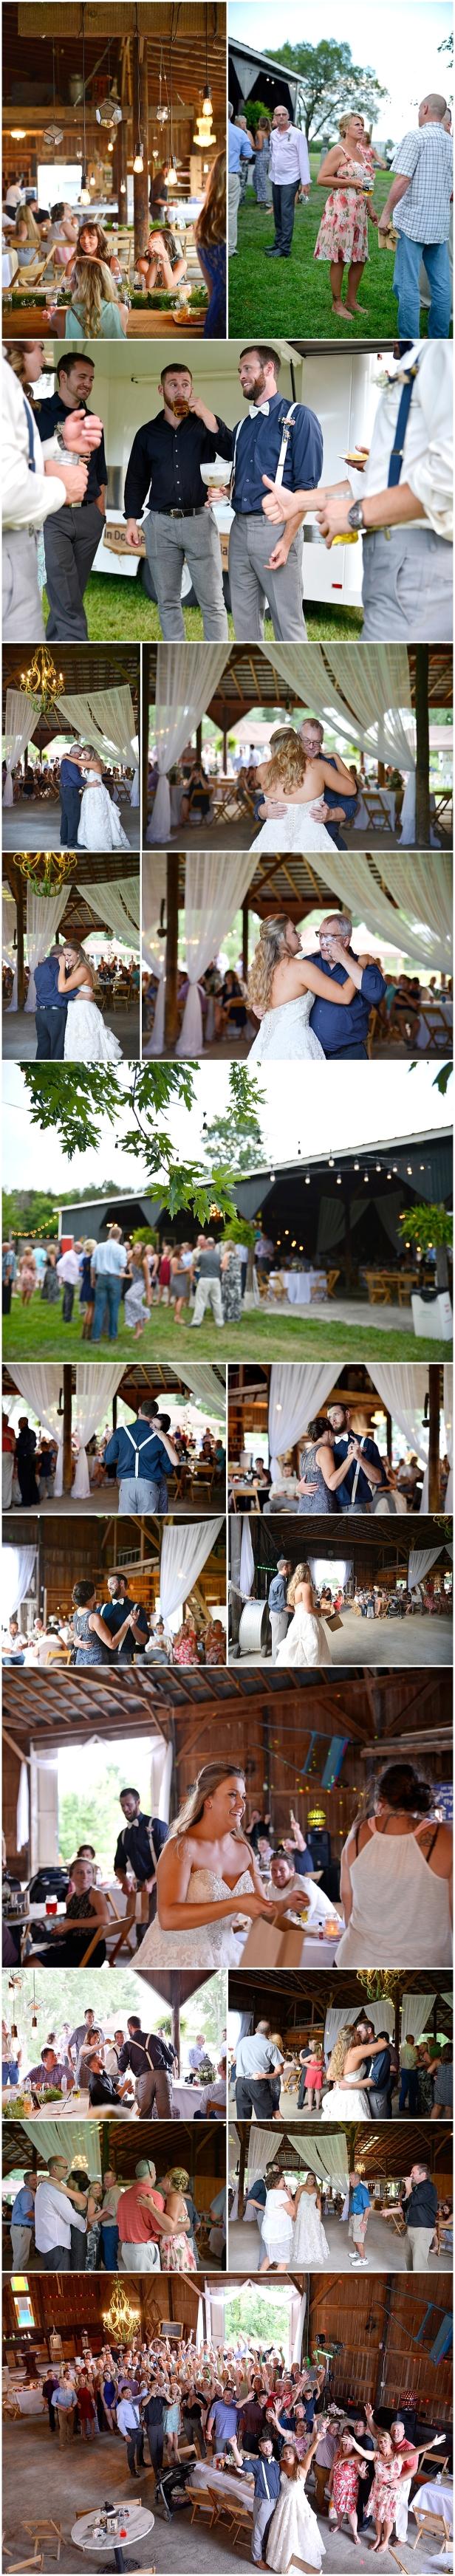 barn-wedding-reception-delaware-ohio